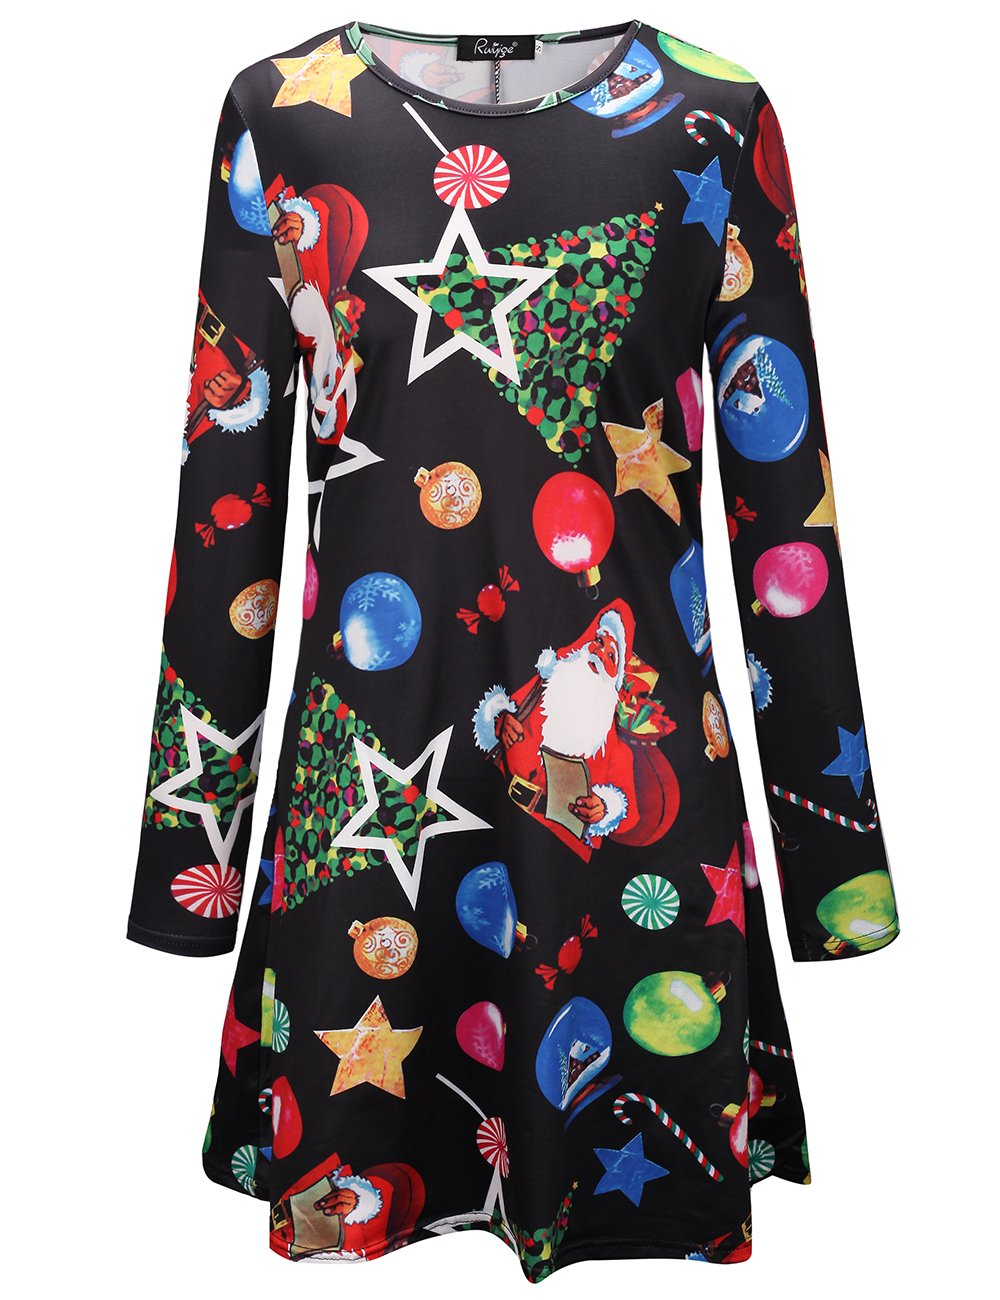 Womens Christmas Swing Dress Long Sleeve Santa Snowflake Colourful Special Gift G195-K195